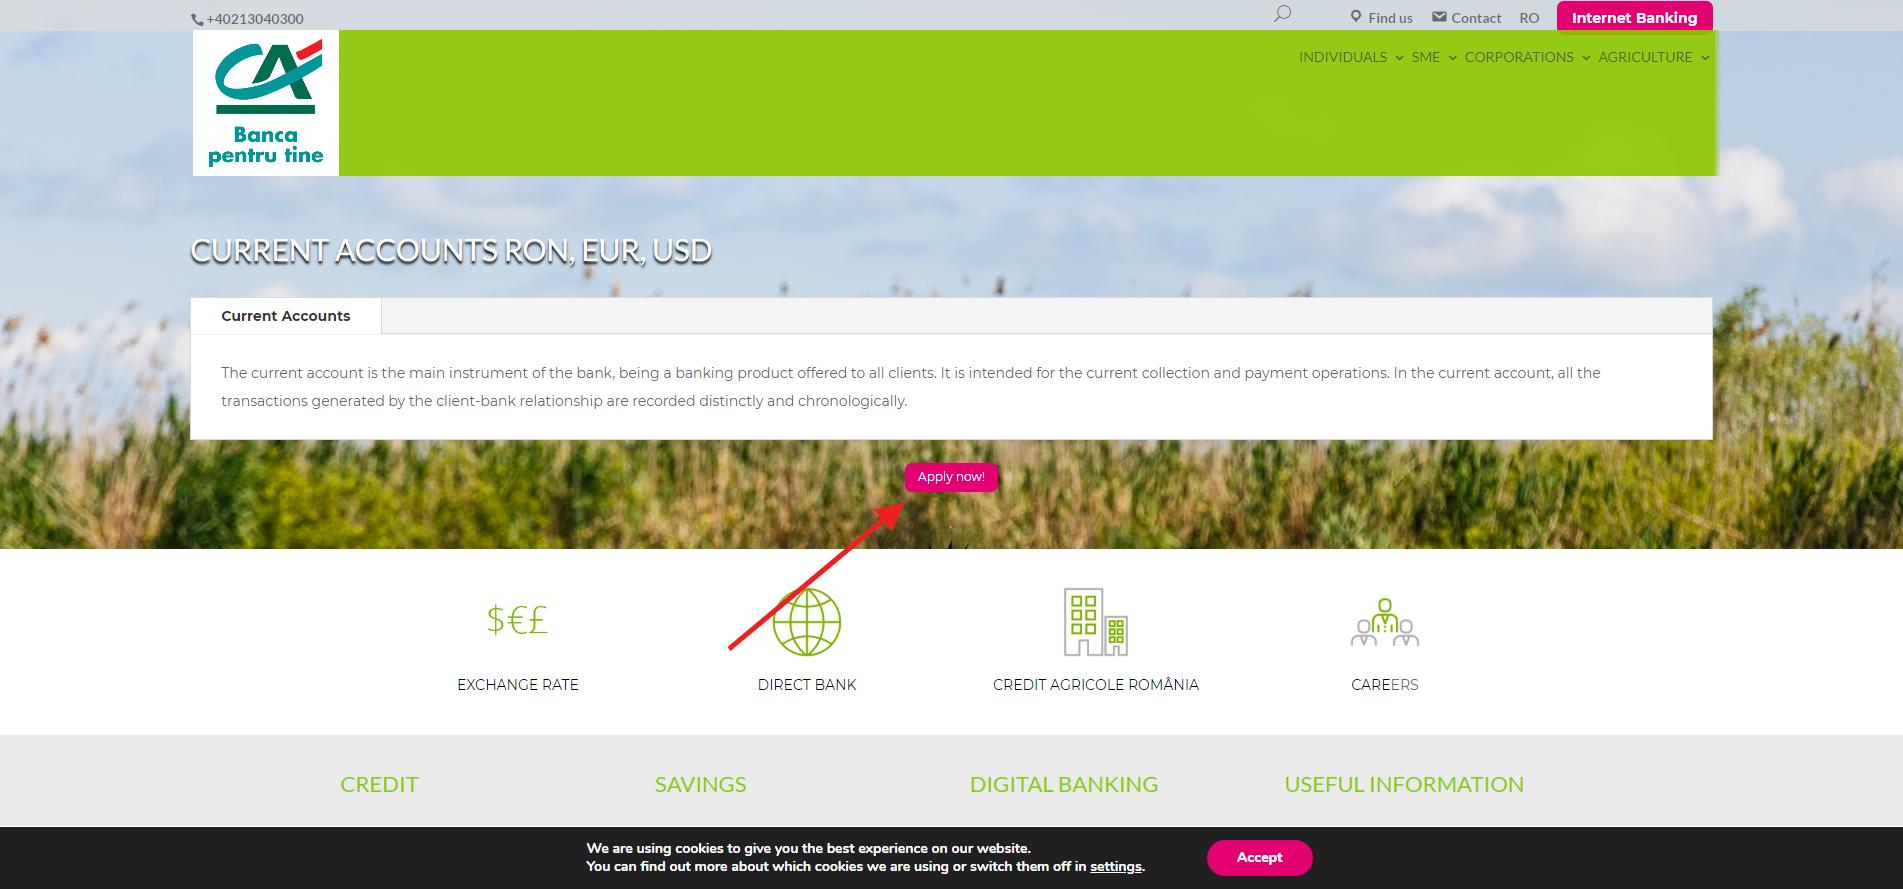 Credit agricole online